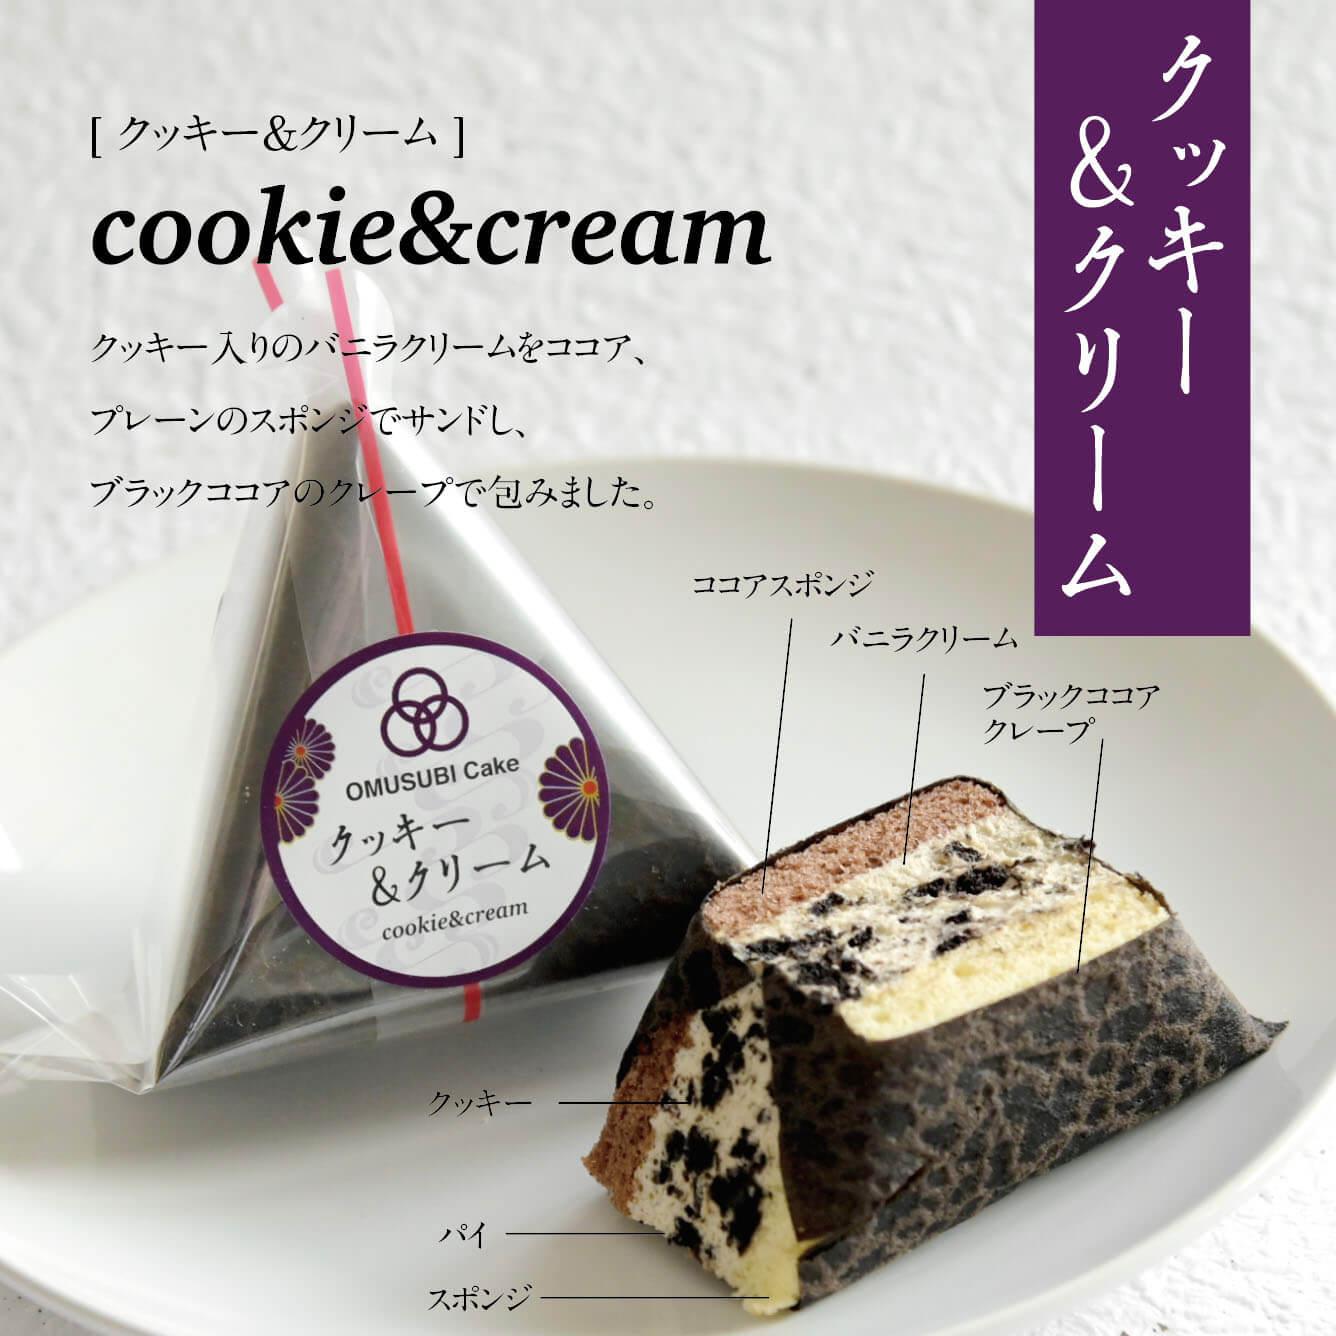 OSAKA OMUSUBI CakeのCookie&Cream/¥450(税込み)